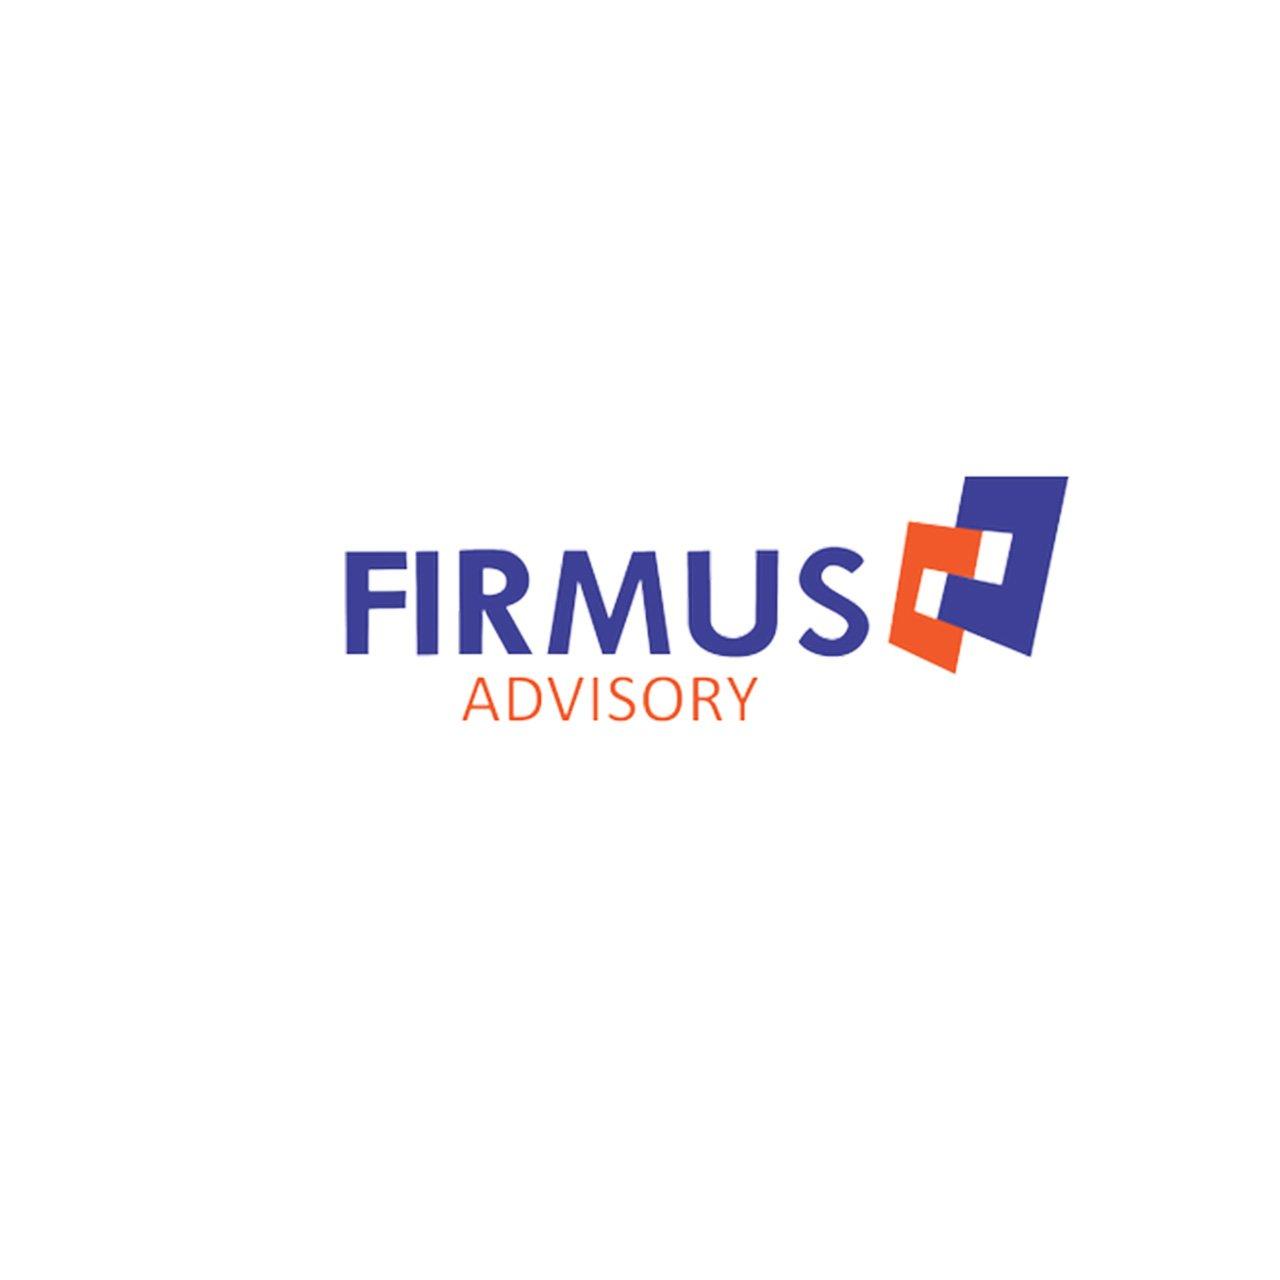 Firmus Advisory